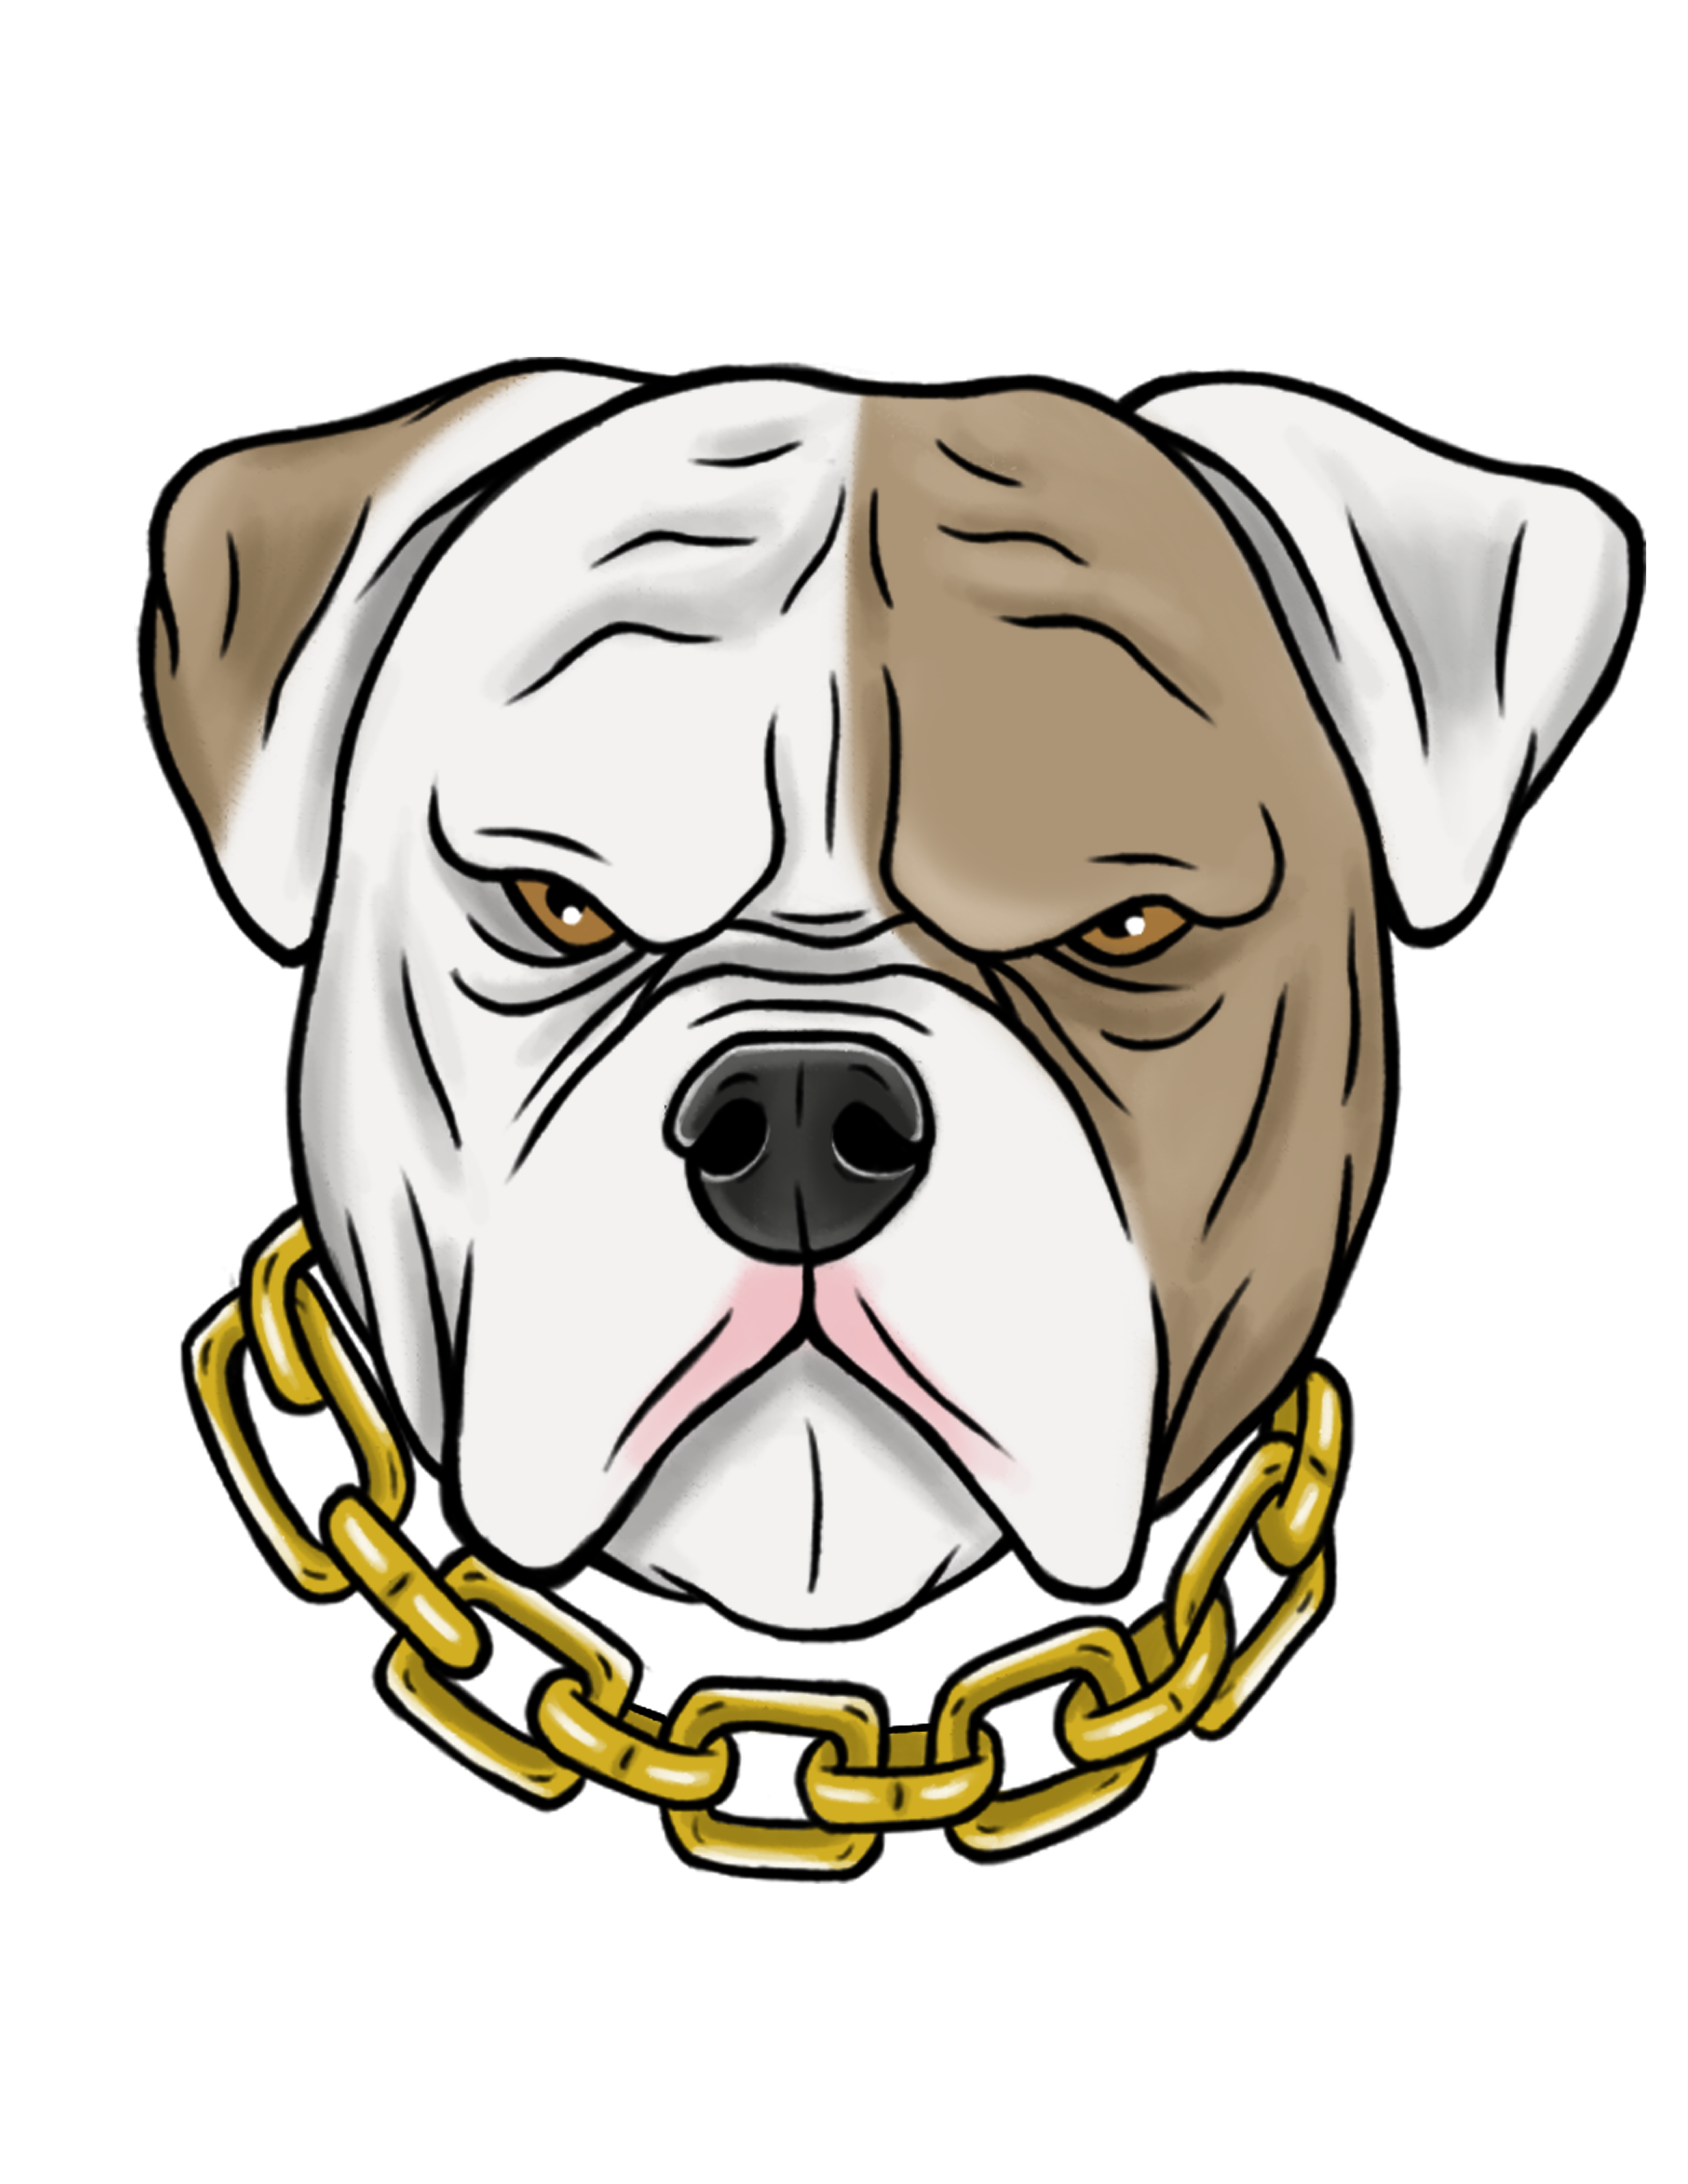 Mad American Bulldog Illustration Pitbull Desenho Desenhos De